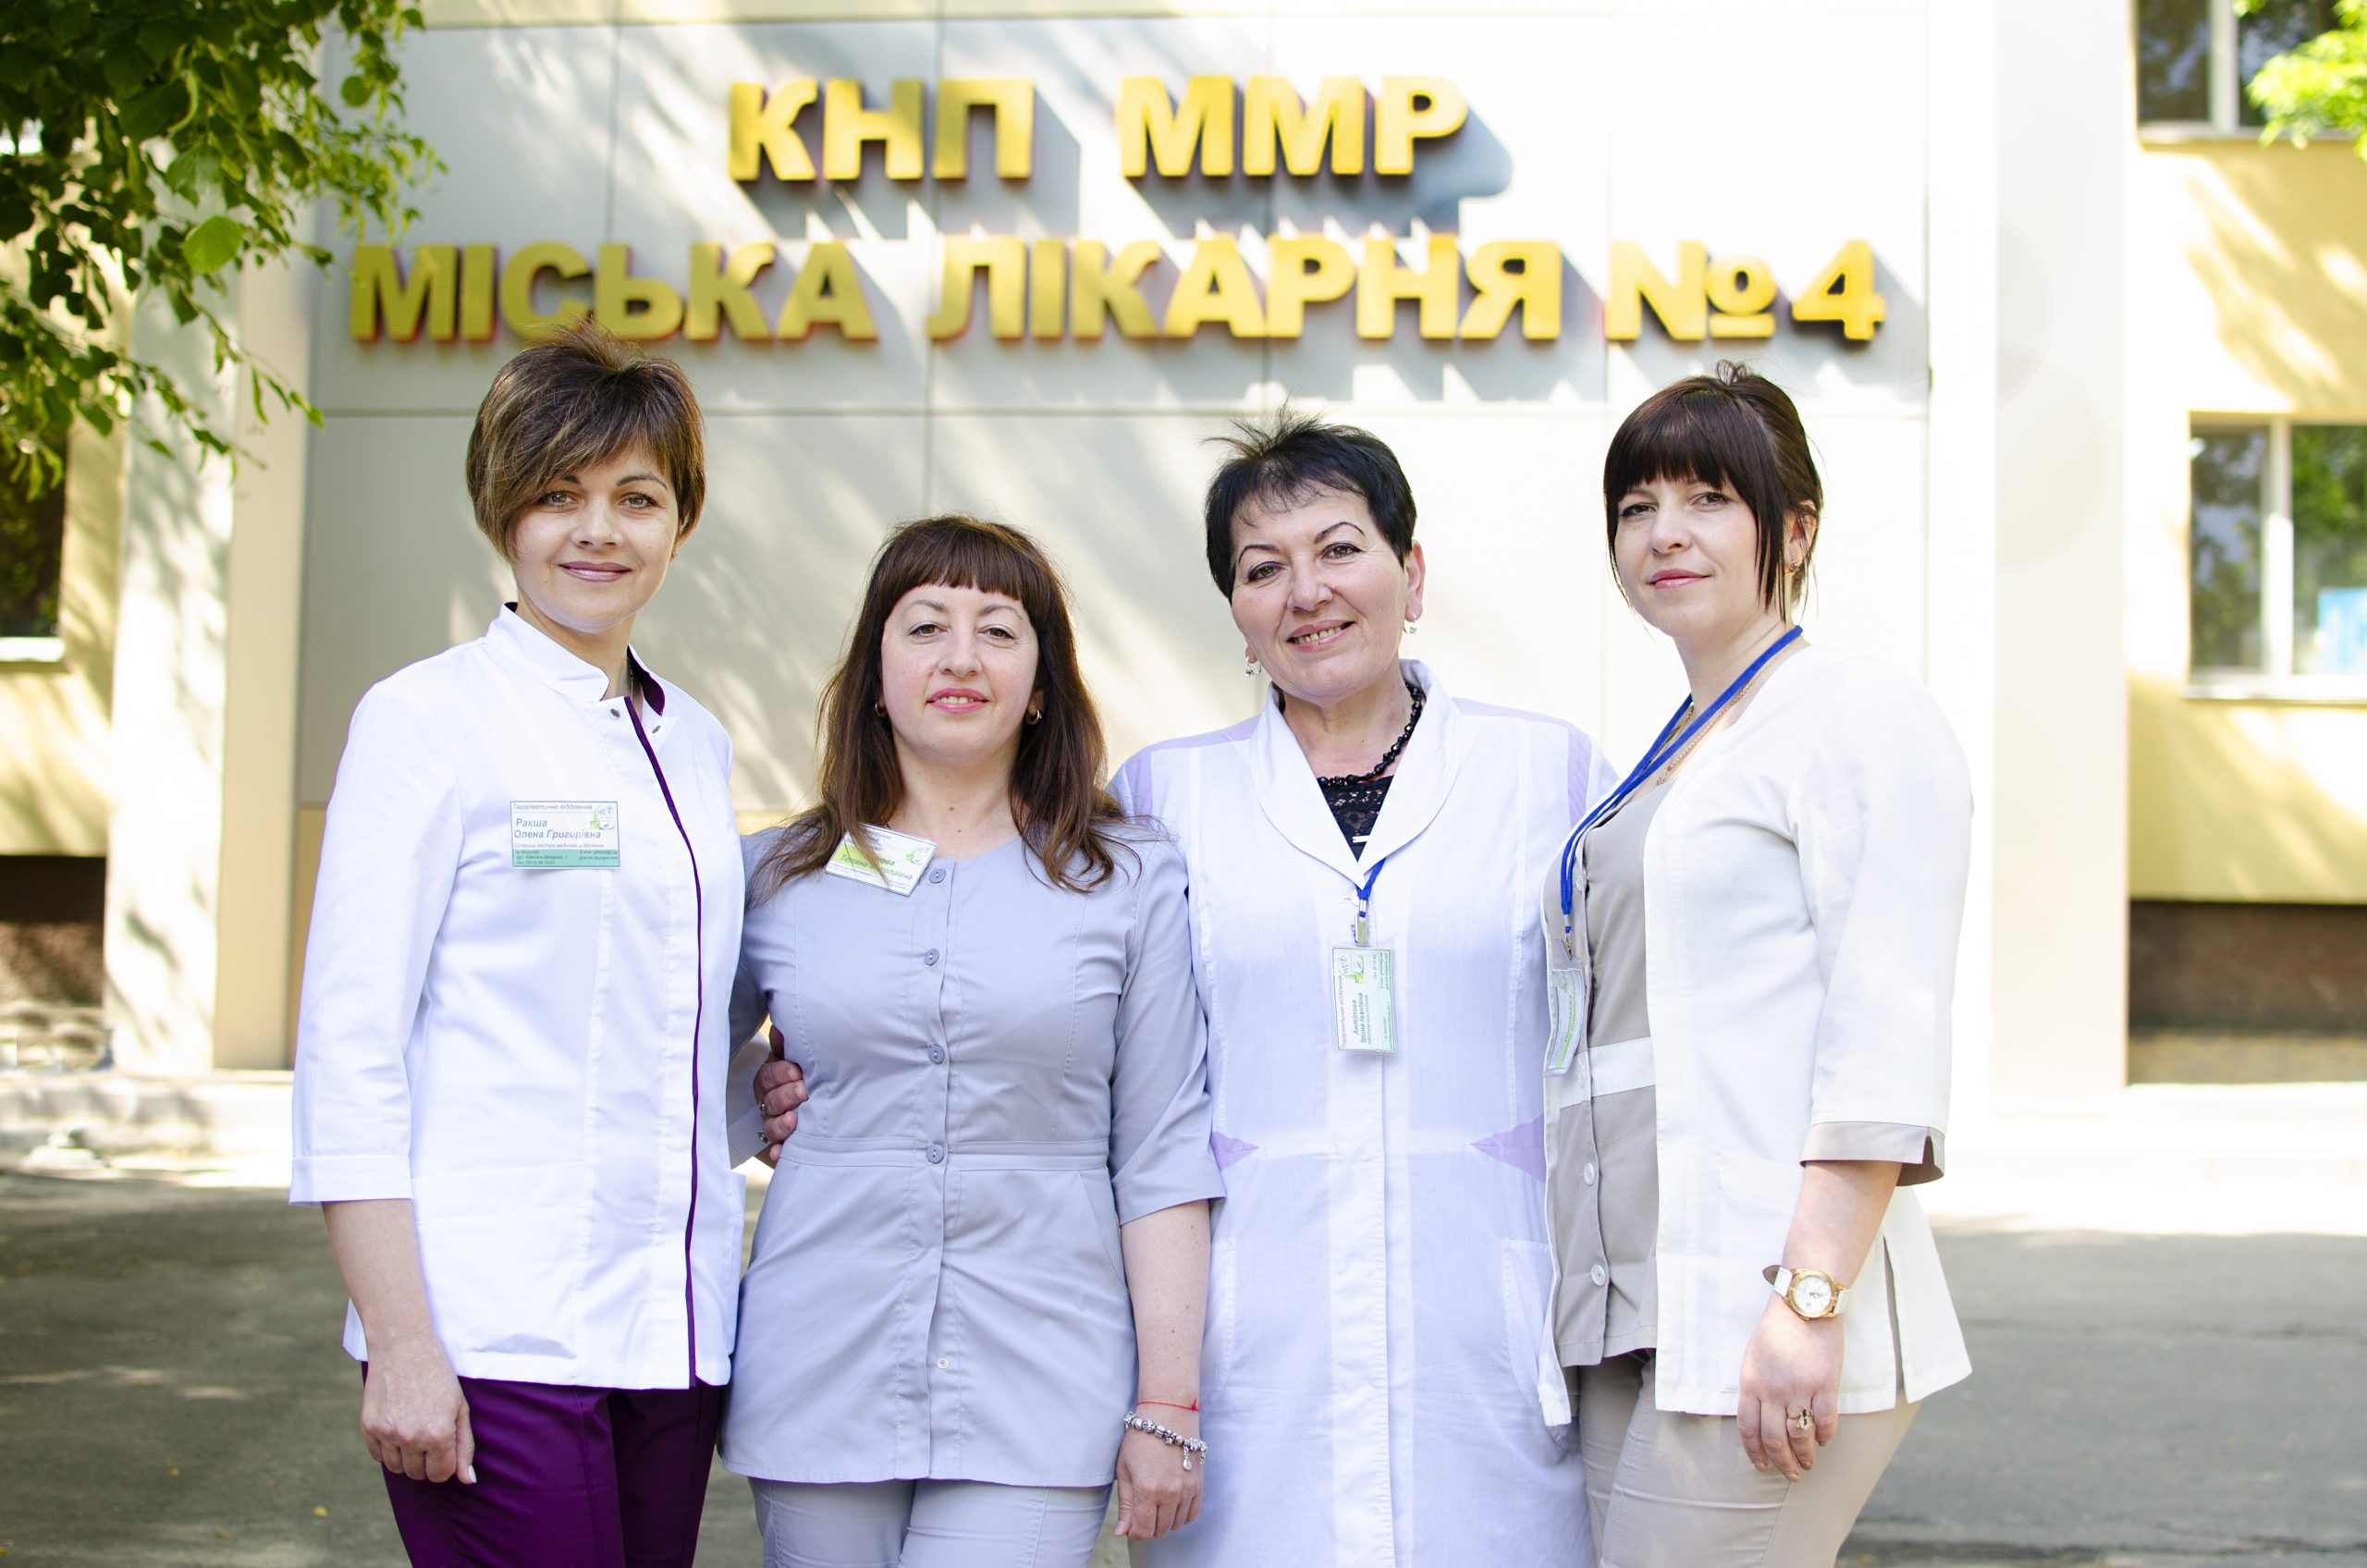 http://lik4.mk.ua/wp-content/uploads/2021/07/PHO_1515я-scaled.jpg